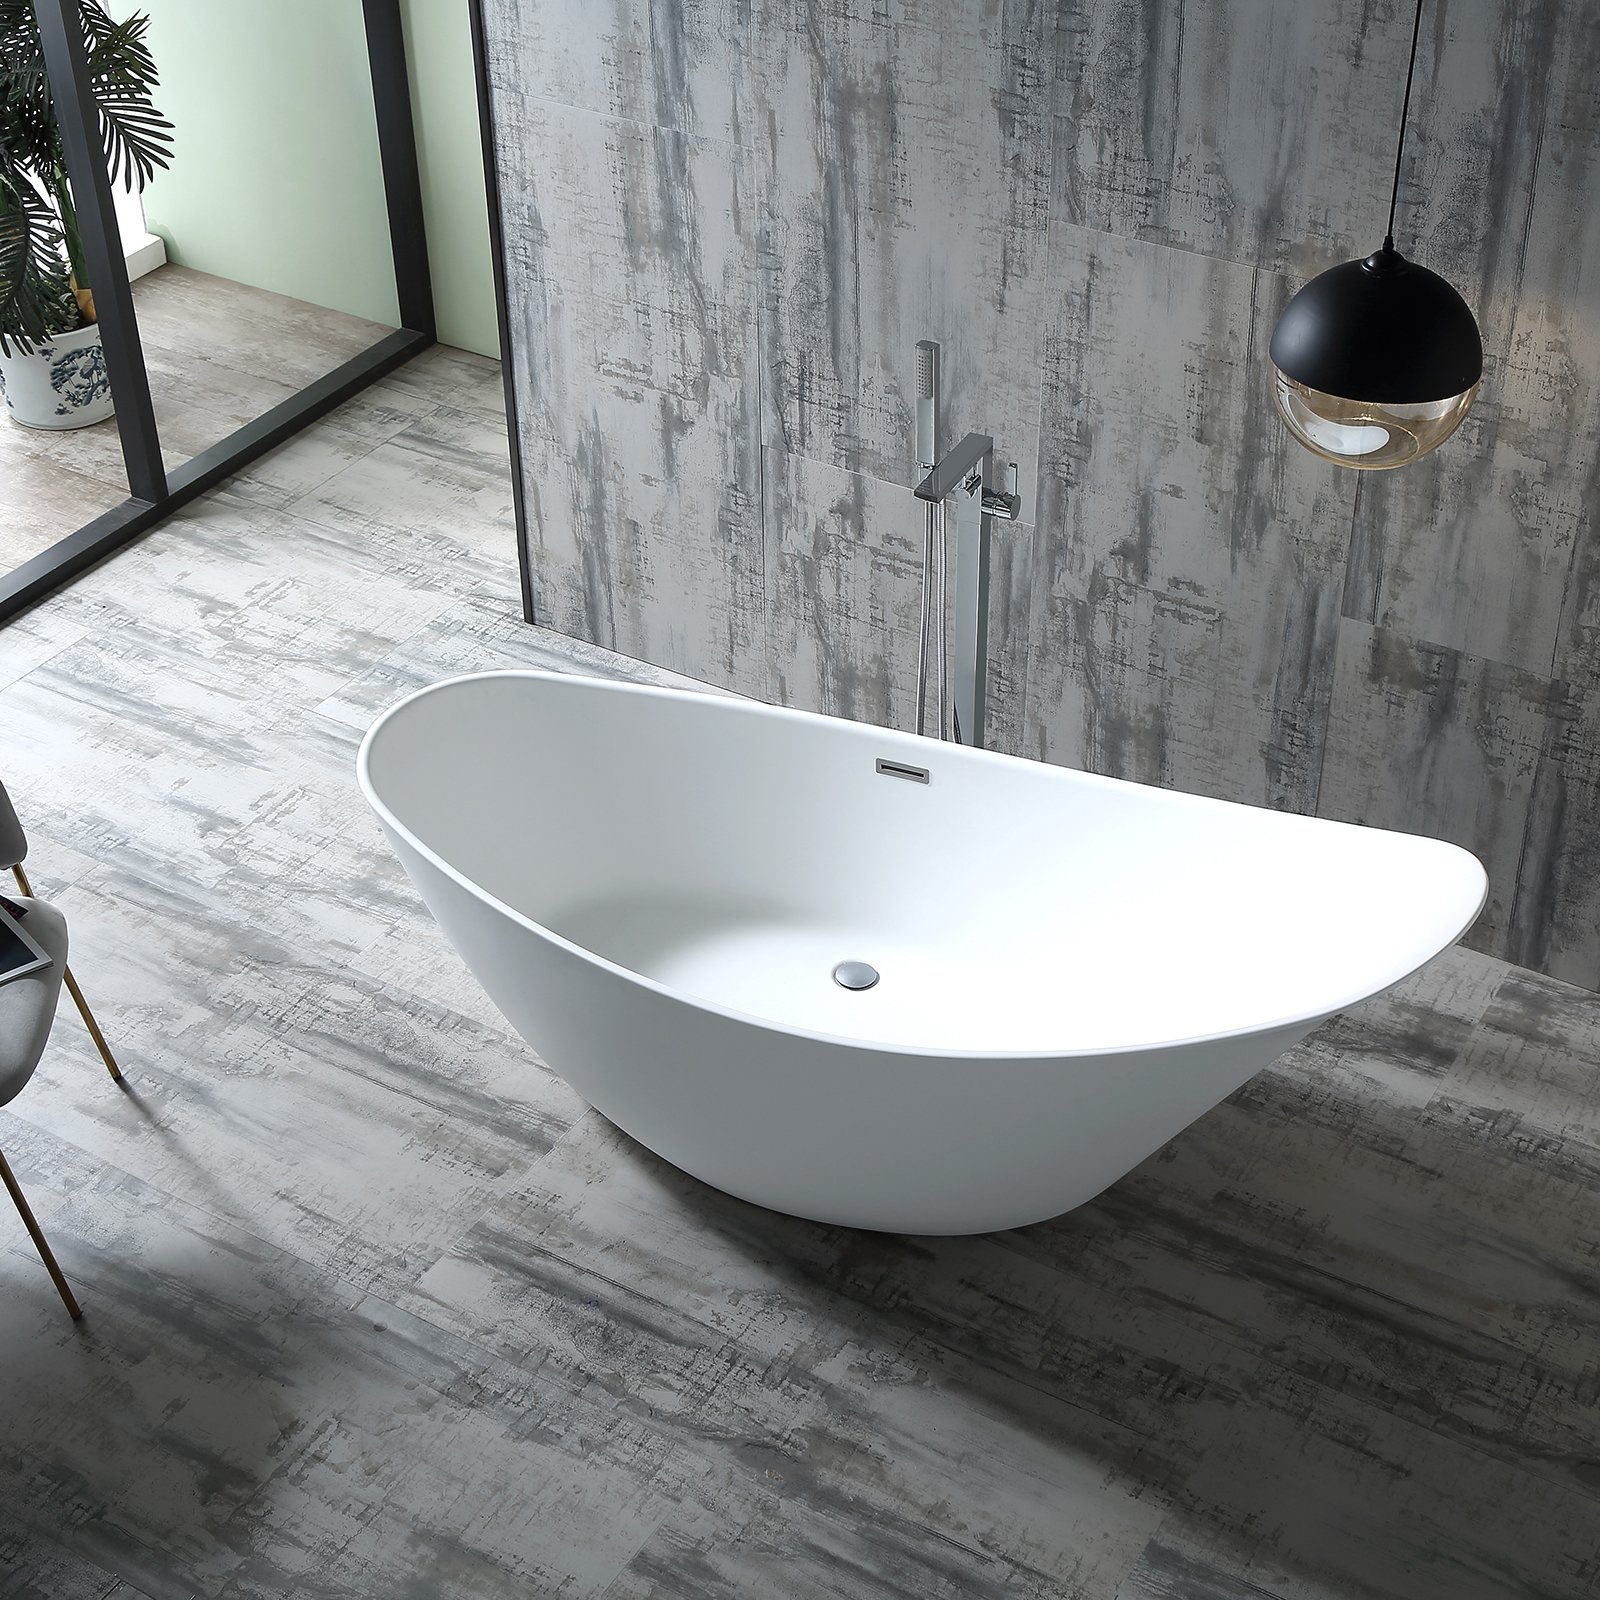 Freistehende Badewanne SOPHIE Acryl Weiß - 190 x 80 x 82,80 cm - Standarmatur wählbar